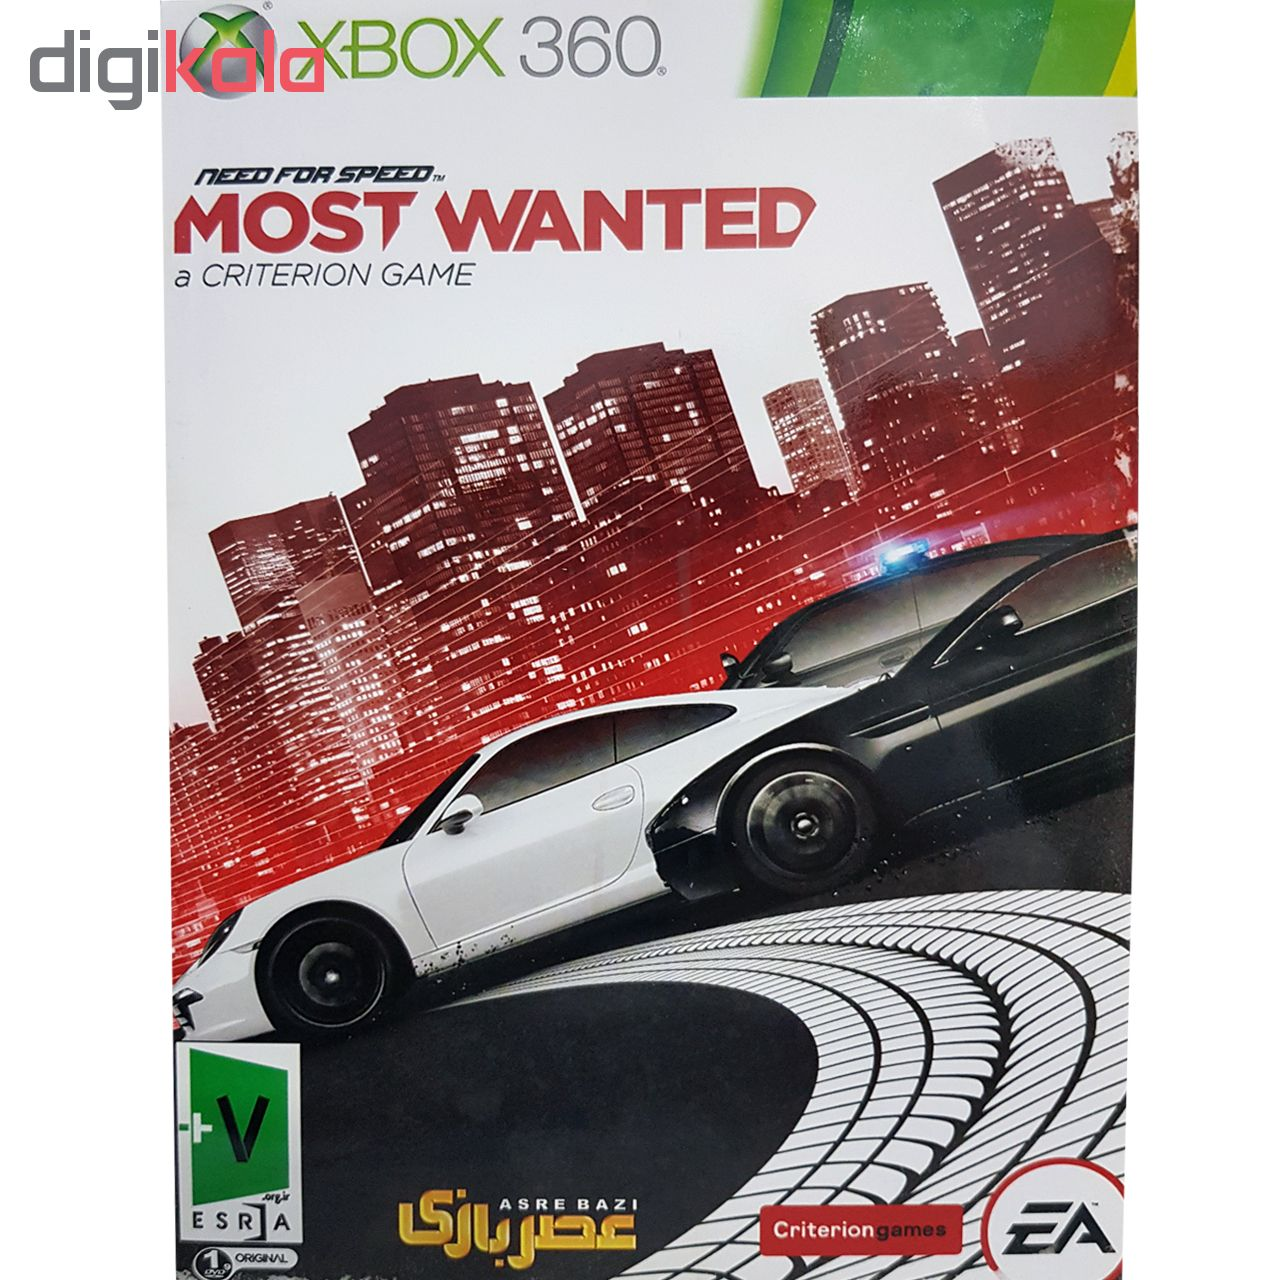 بازی Need for Speed Most Wanted مخصوص xbox 360 نشر عصر بازی